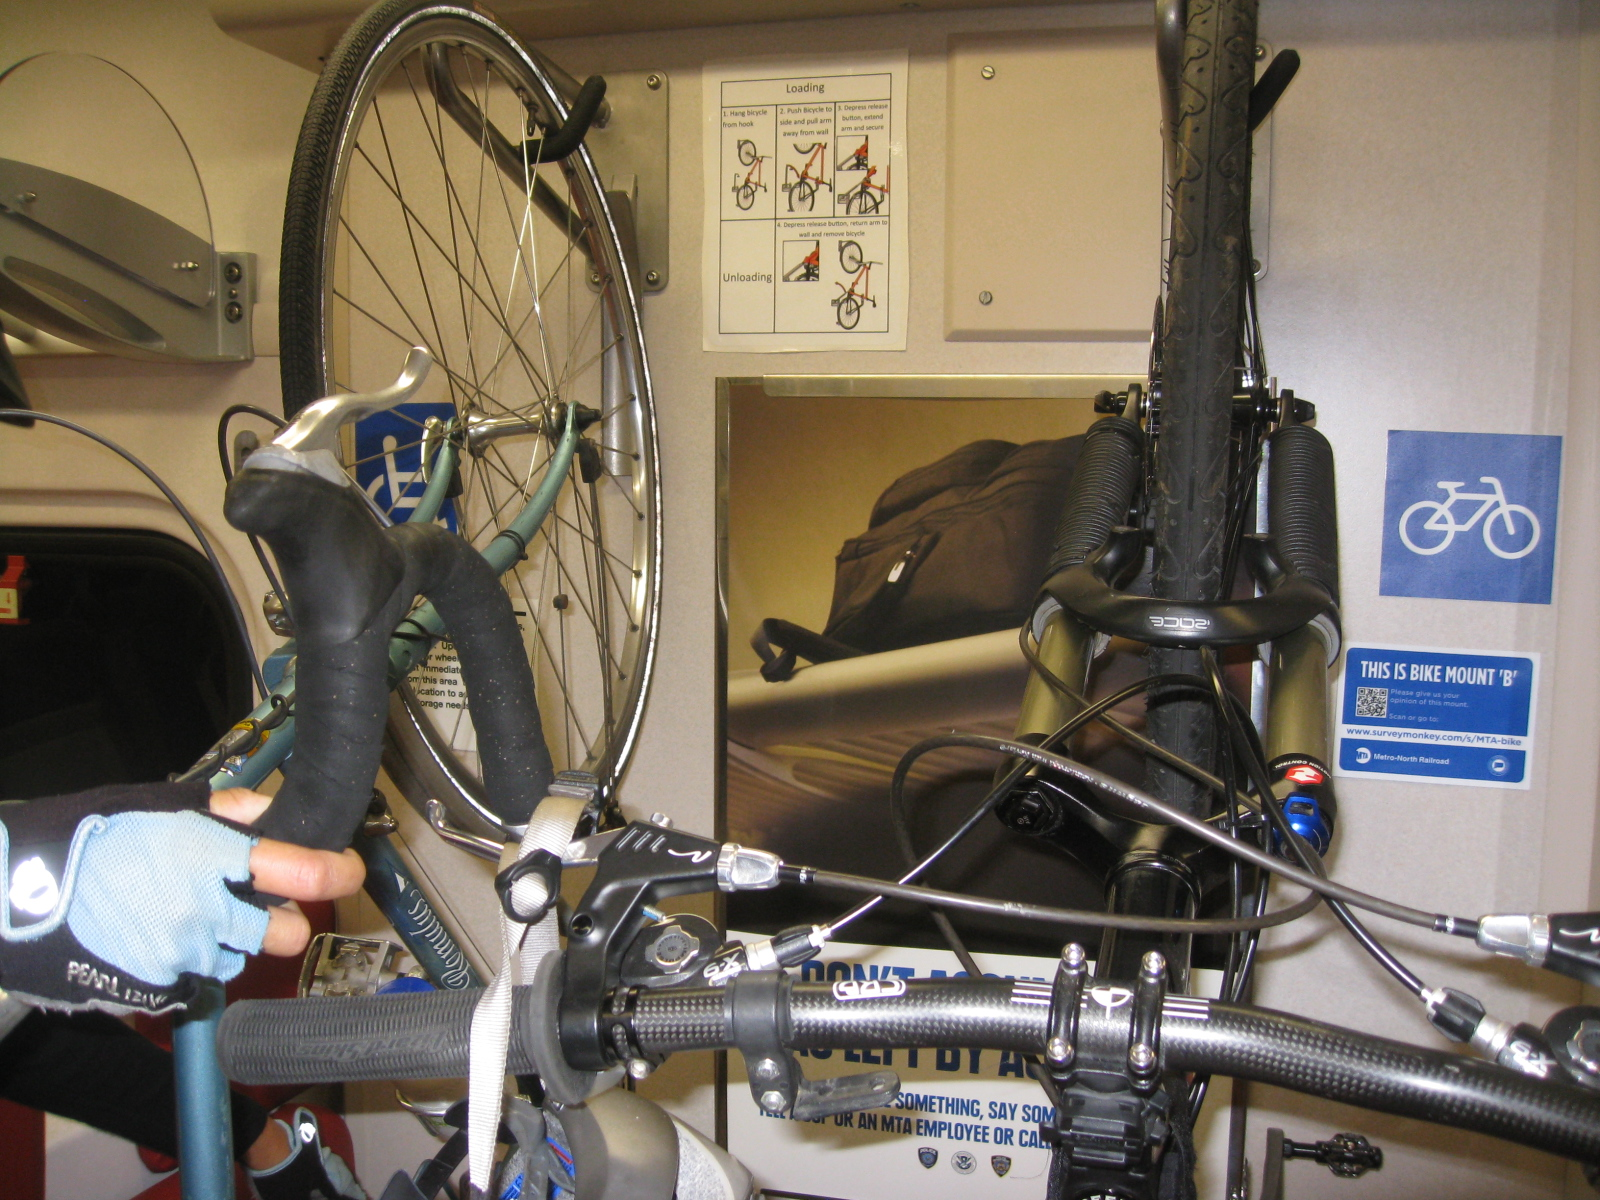 Bikes On Metro North Cyclist s Bike was there